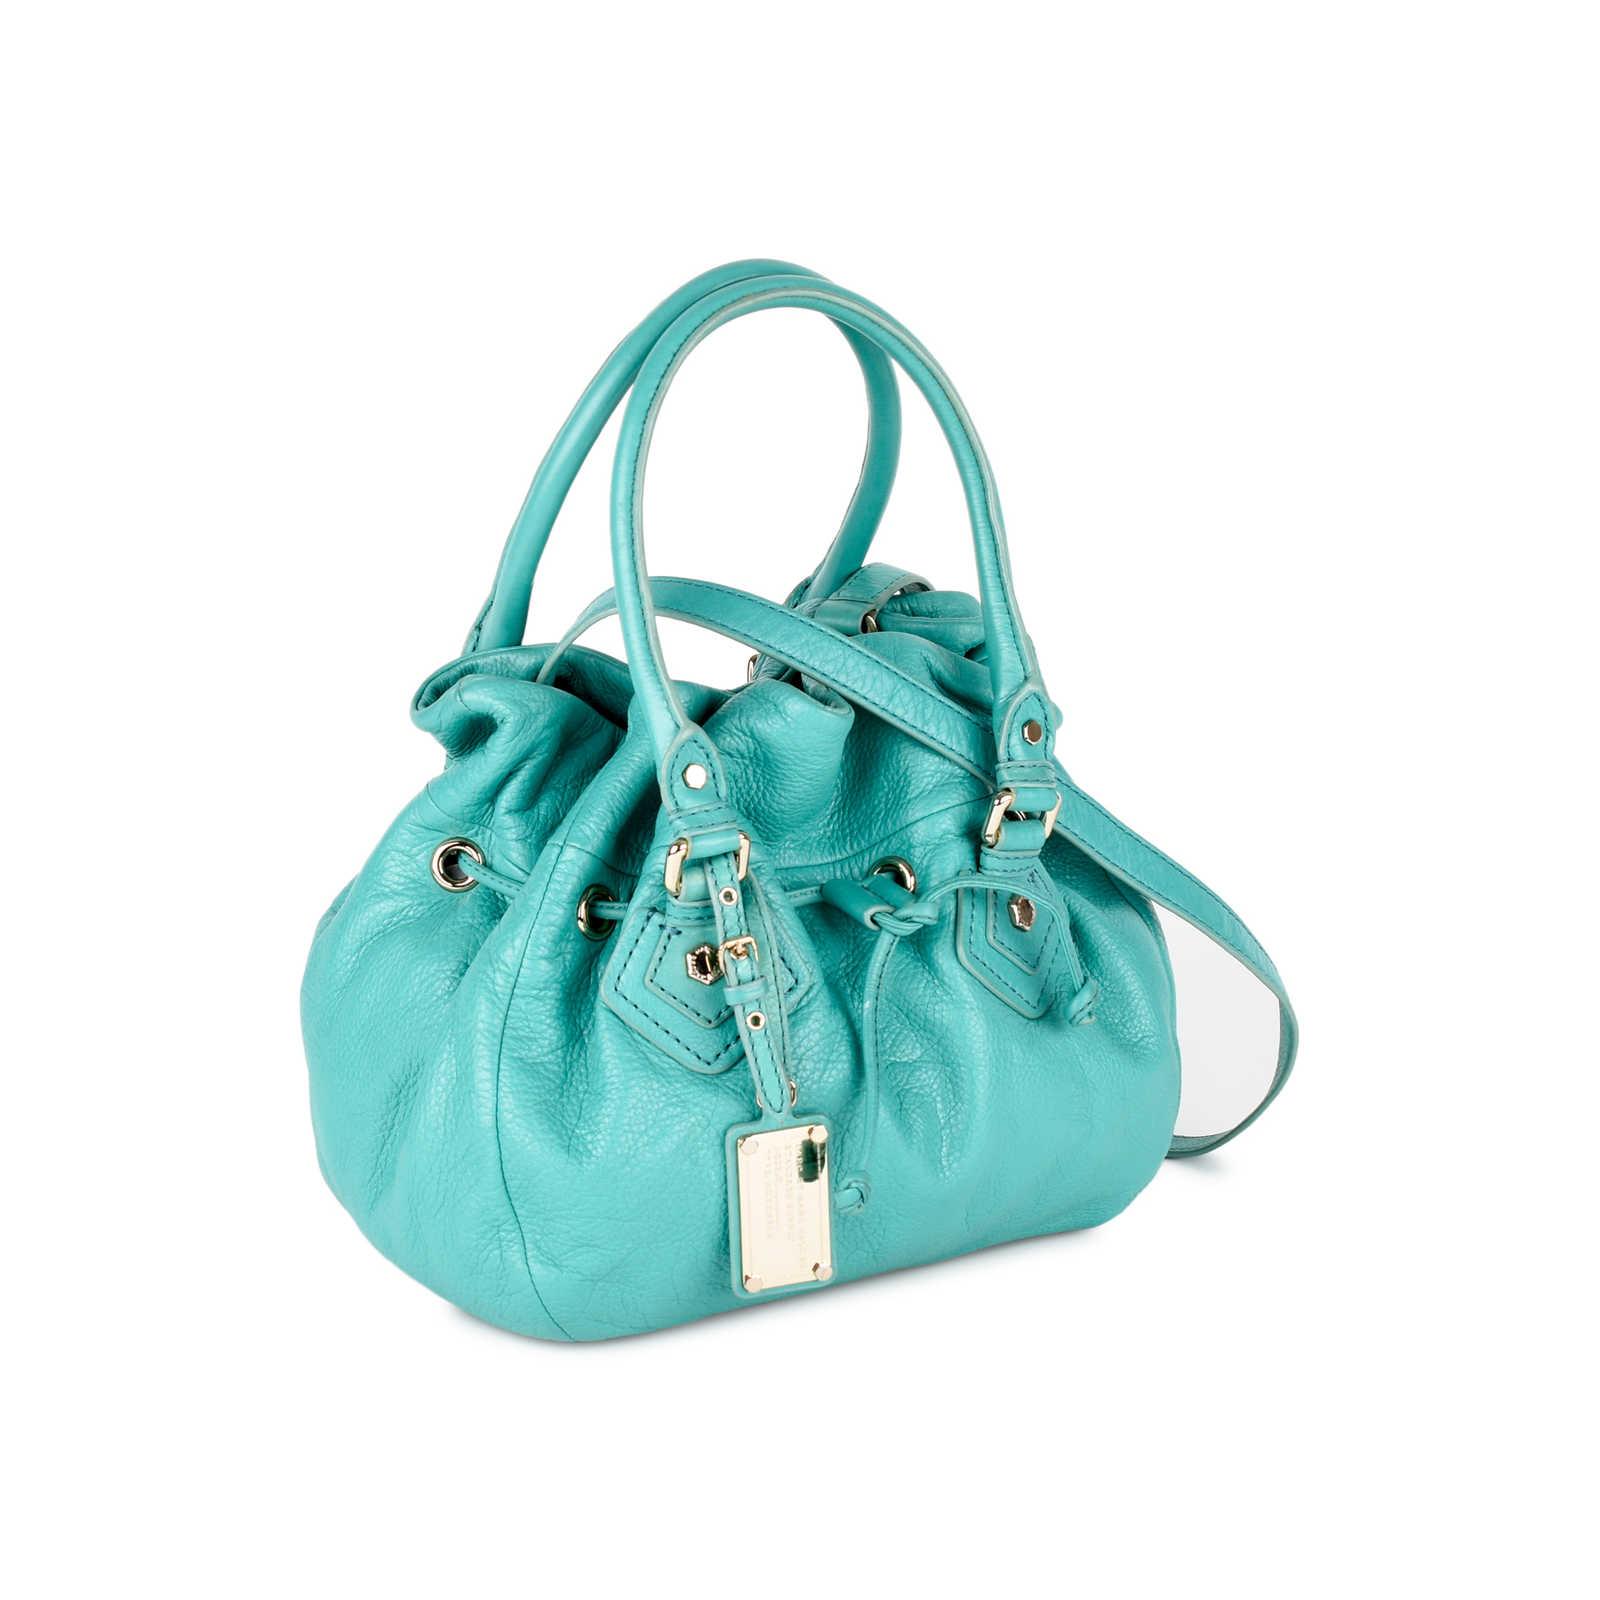 53b429c90cc6 ... Authentic Second Hand Marc by Marc Jacobs Classic Q Drawstring Bag  (PSS-439- ...